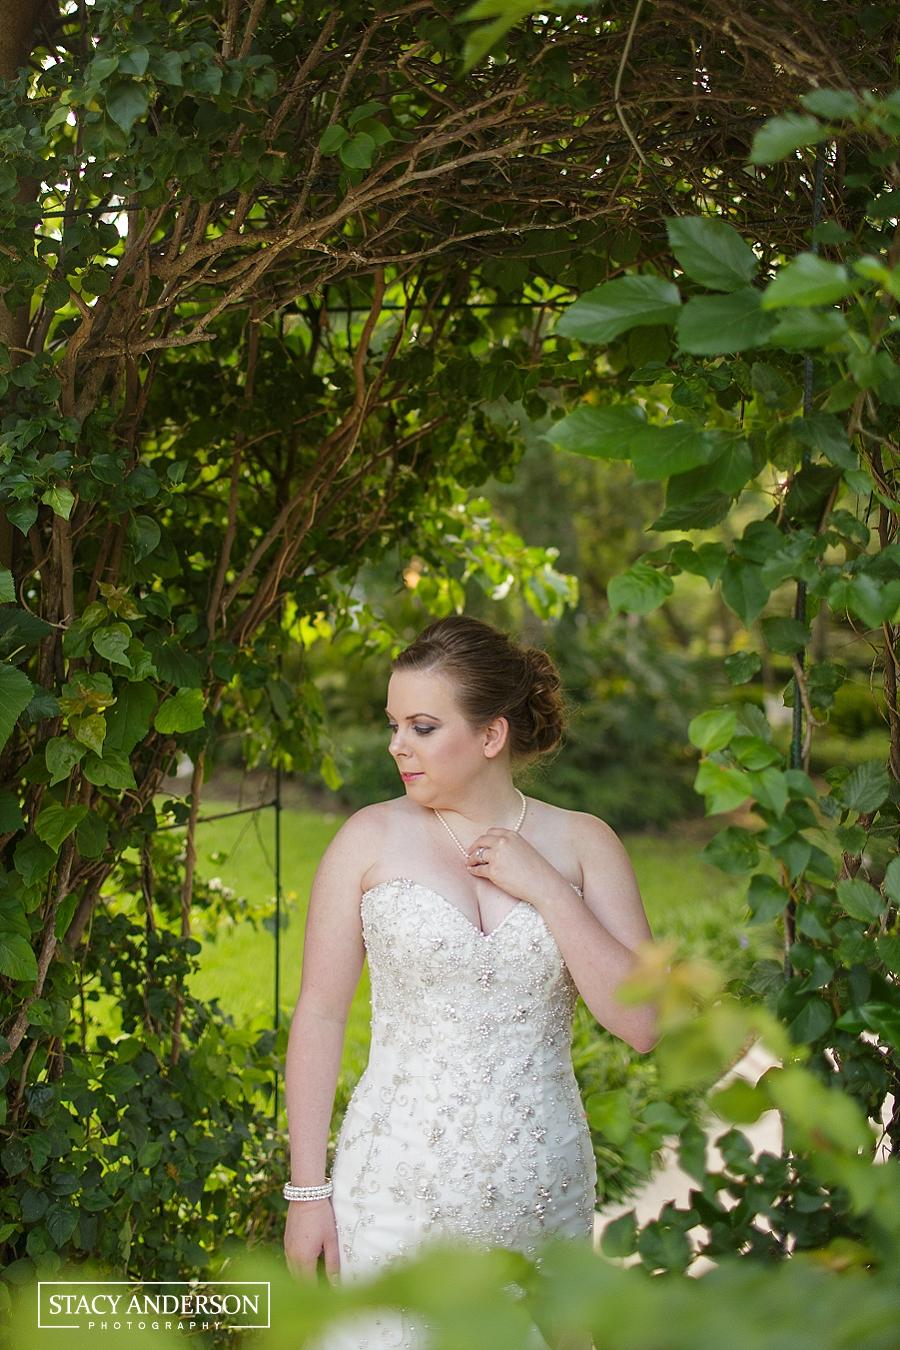 Stacy Anderson Photography Heaven on Earth Wedding Photographer_1701